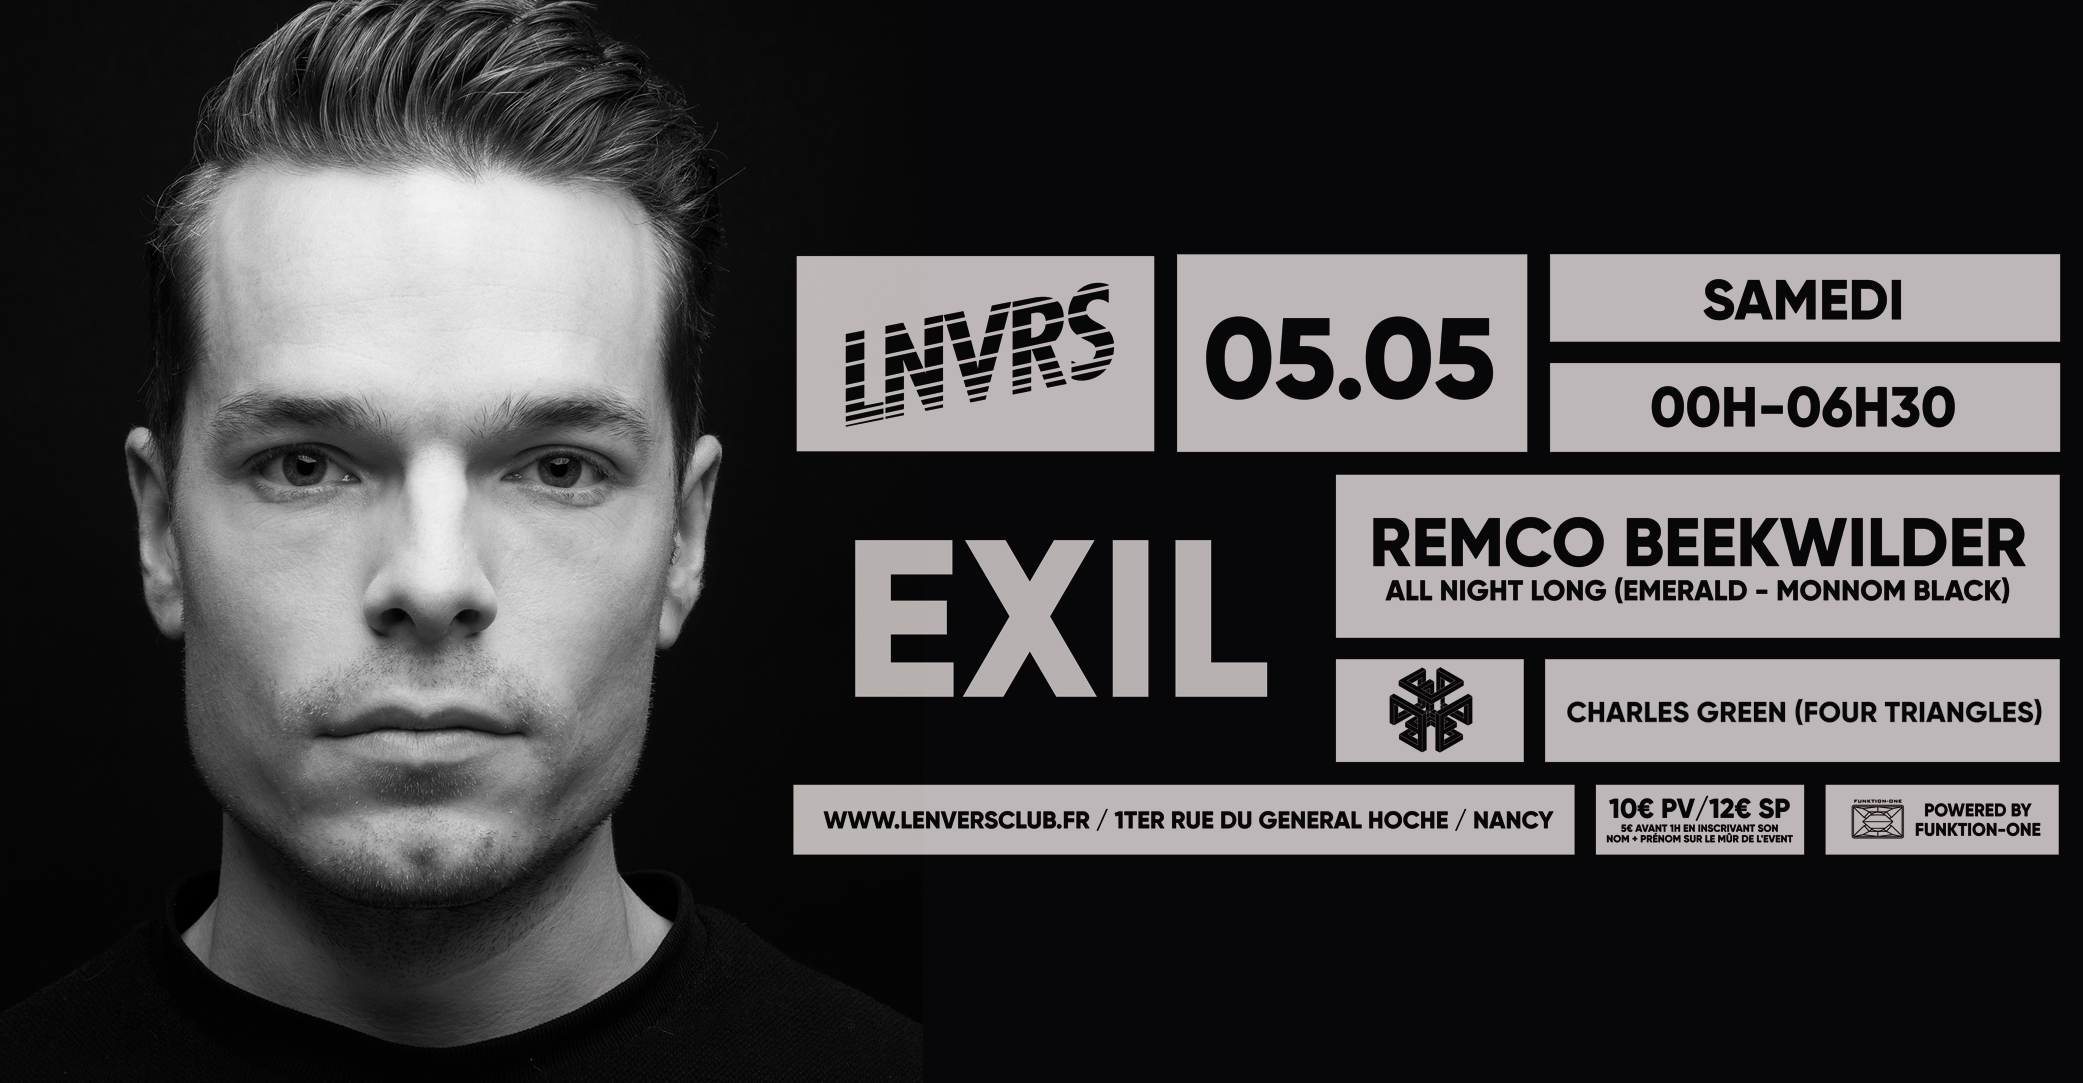 Exil / Remco Beekwilder All Night Long / LNVRS